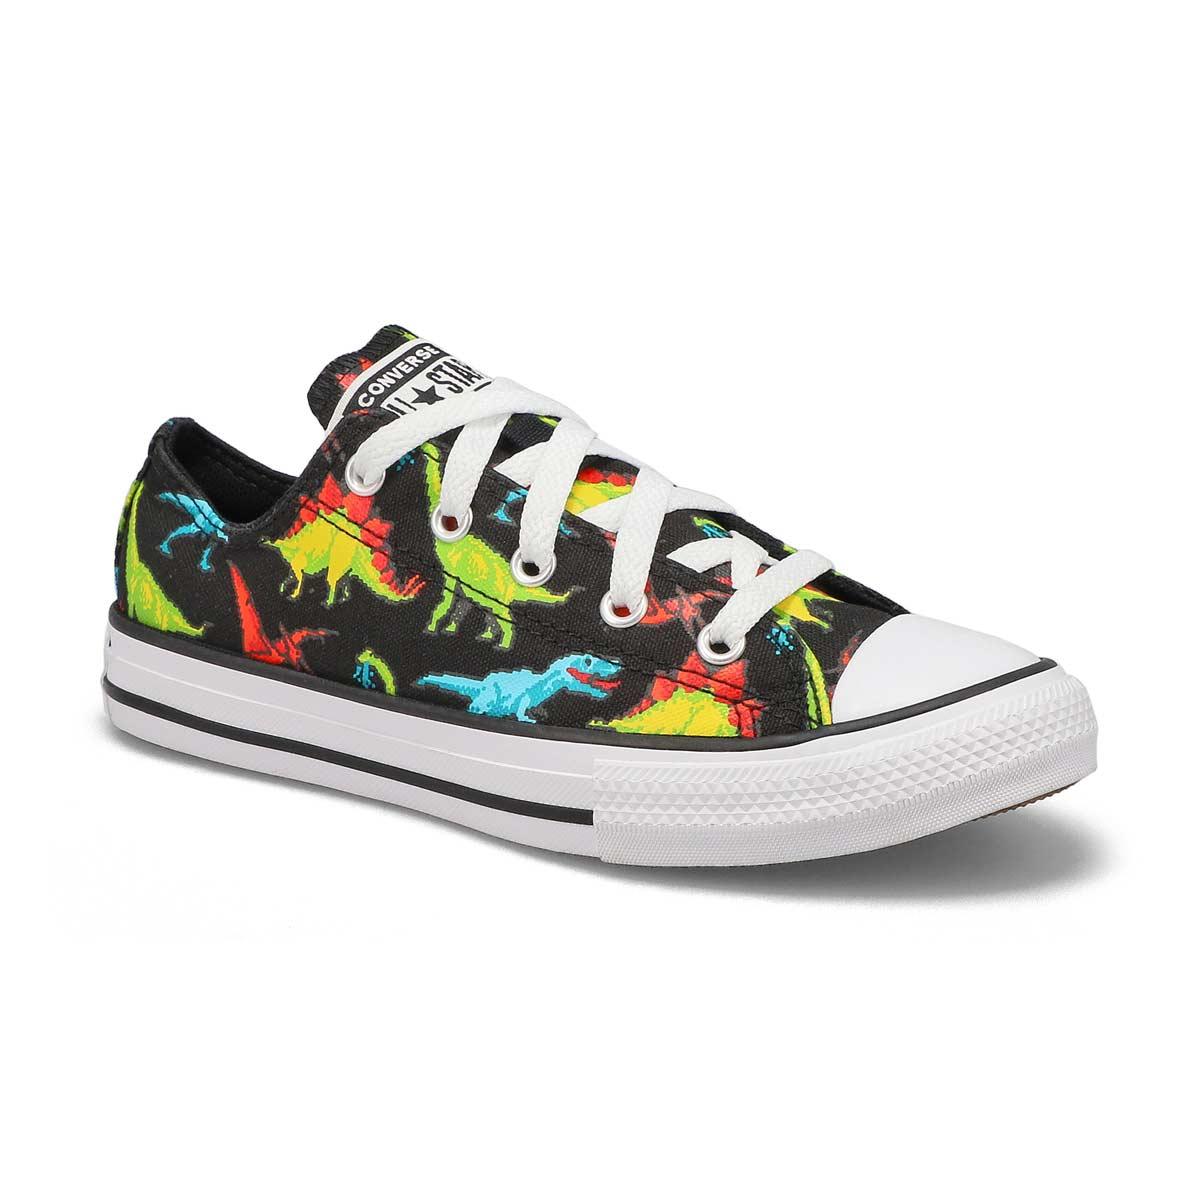 Boys' Chuck Taylor All Star Dinoverse Sneakers